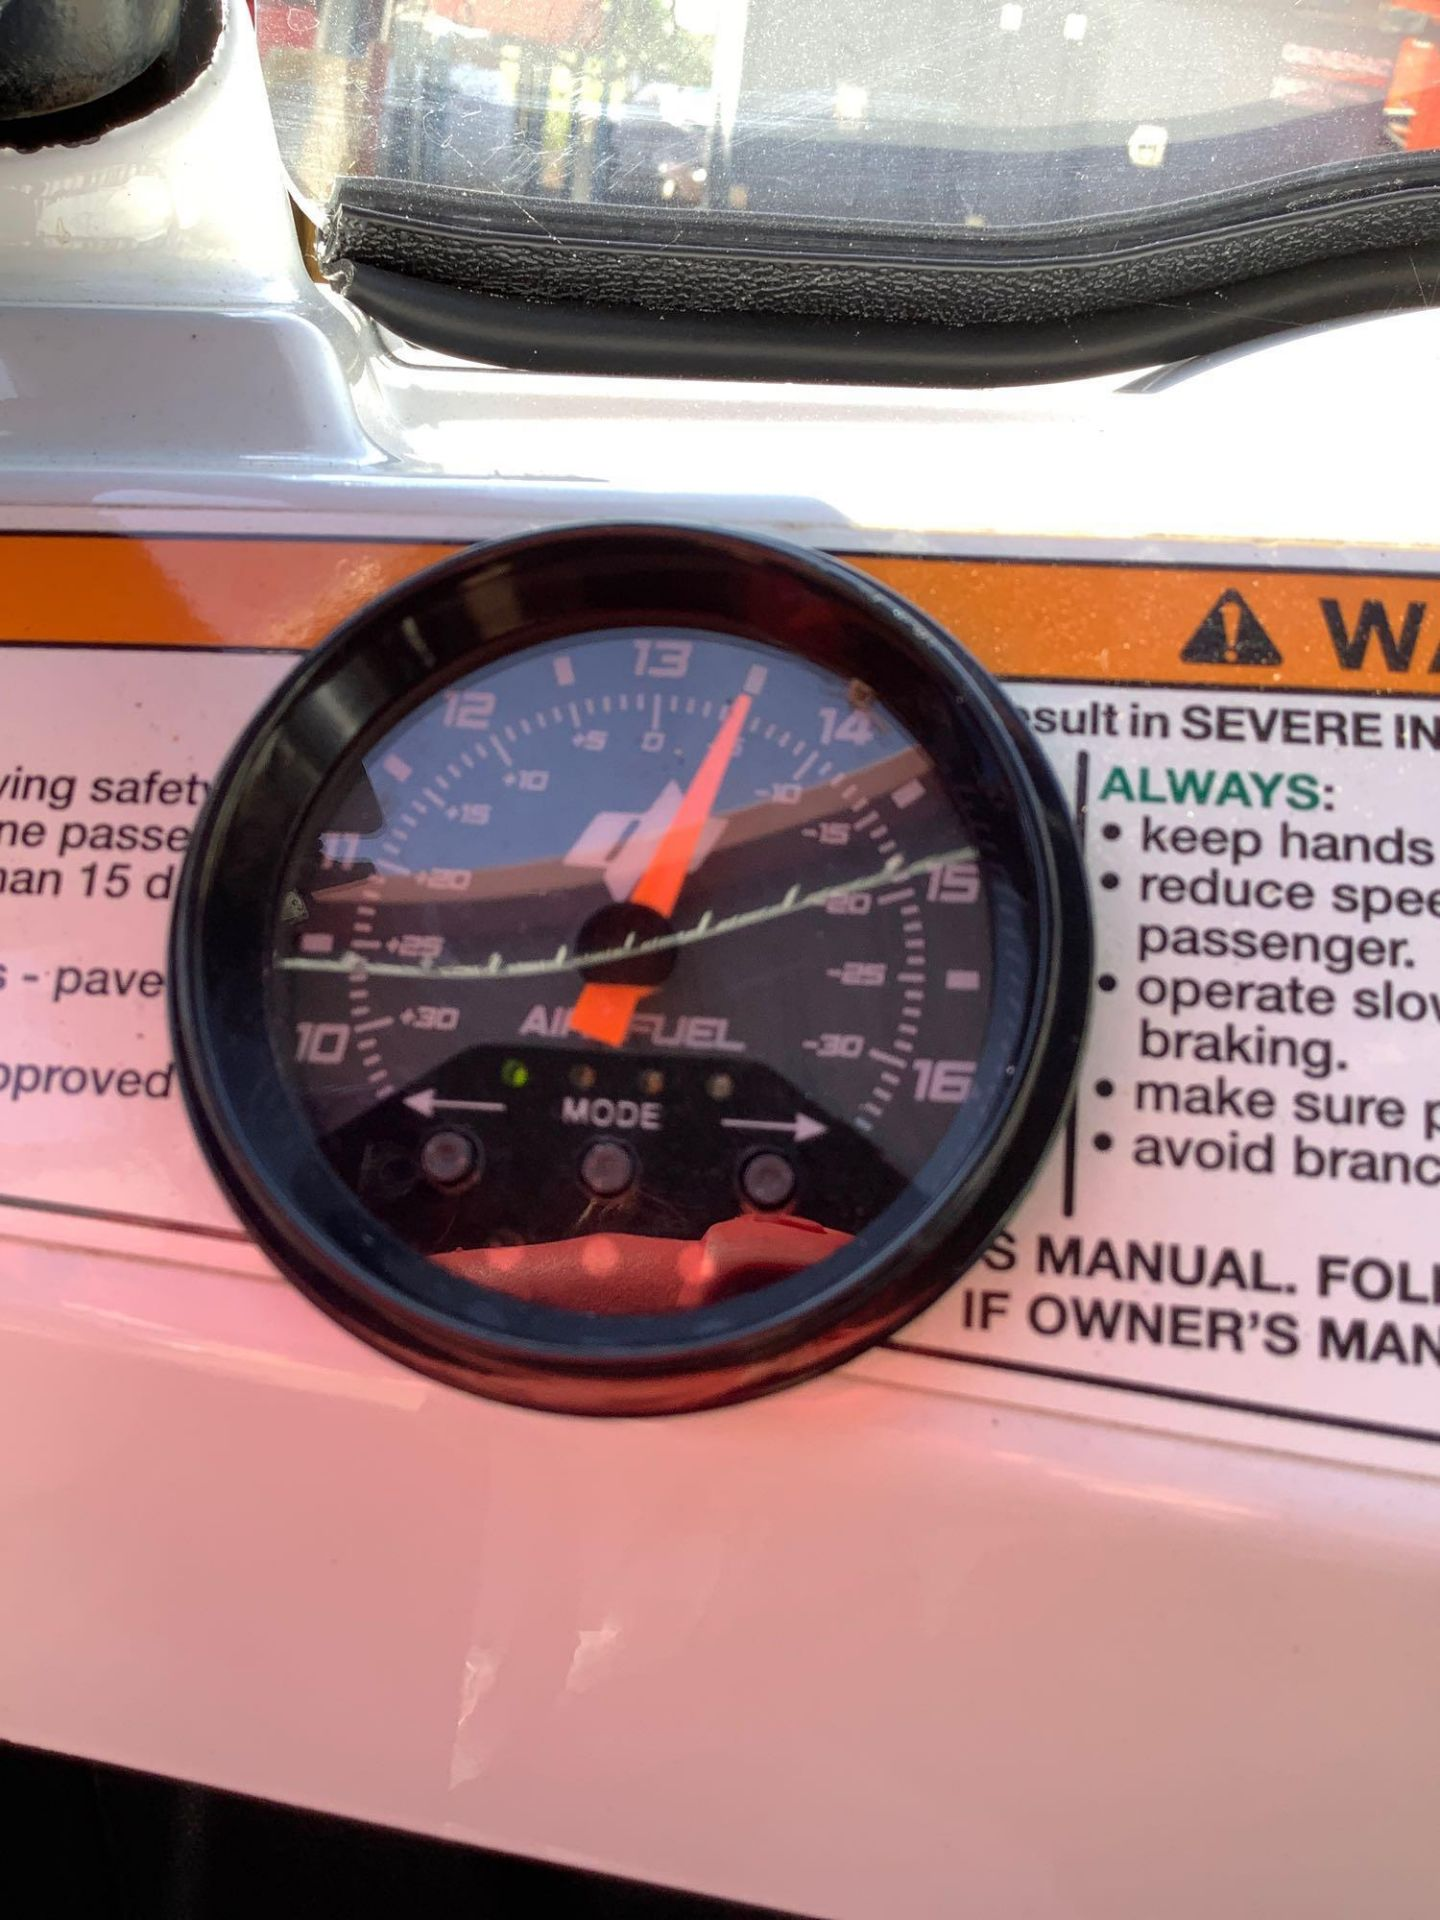 POLARIS RANGER RZR XP 900, TRINITY STAGE 5 RACING MUFFLER, SNORKEL INTAKE, CRUNCH 900 WATTS AMPLIFY - Image 22 of 22